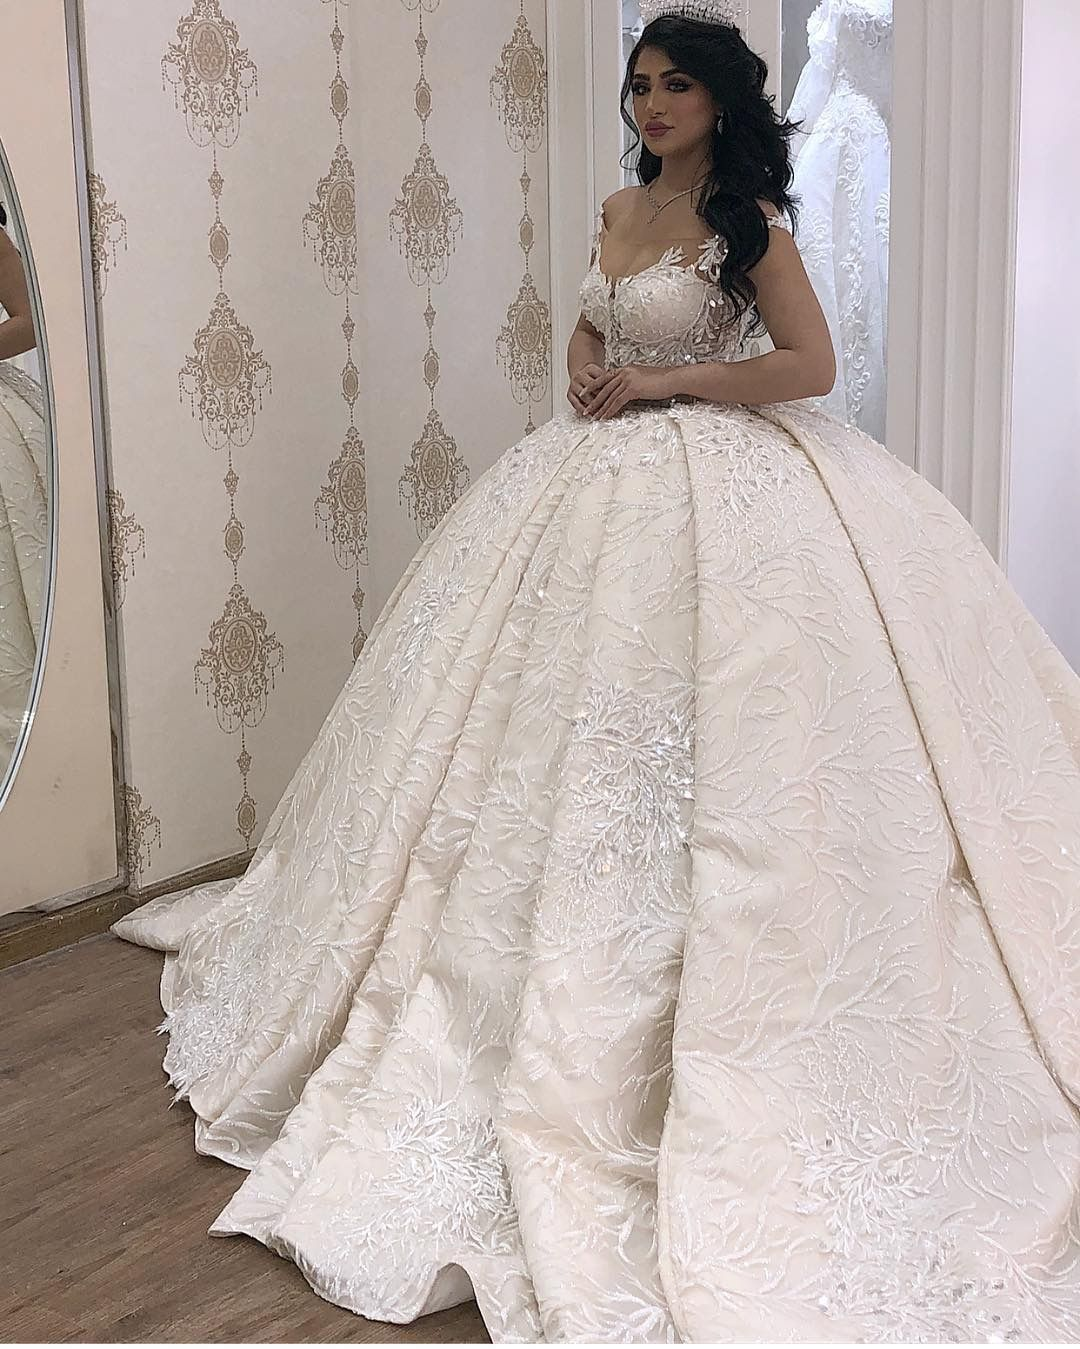 Pin By Aisha Alzaabi On Fashion Wedding Dresses Dream Wedding Dresses Big Wedding Dresses